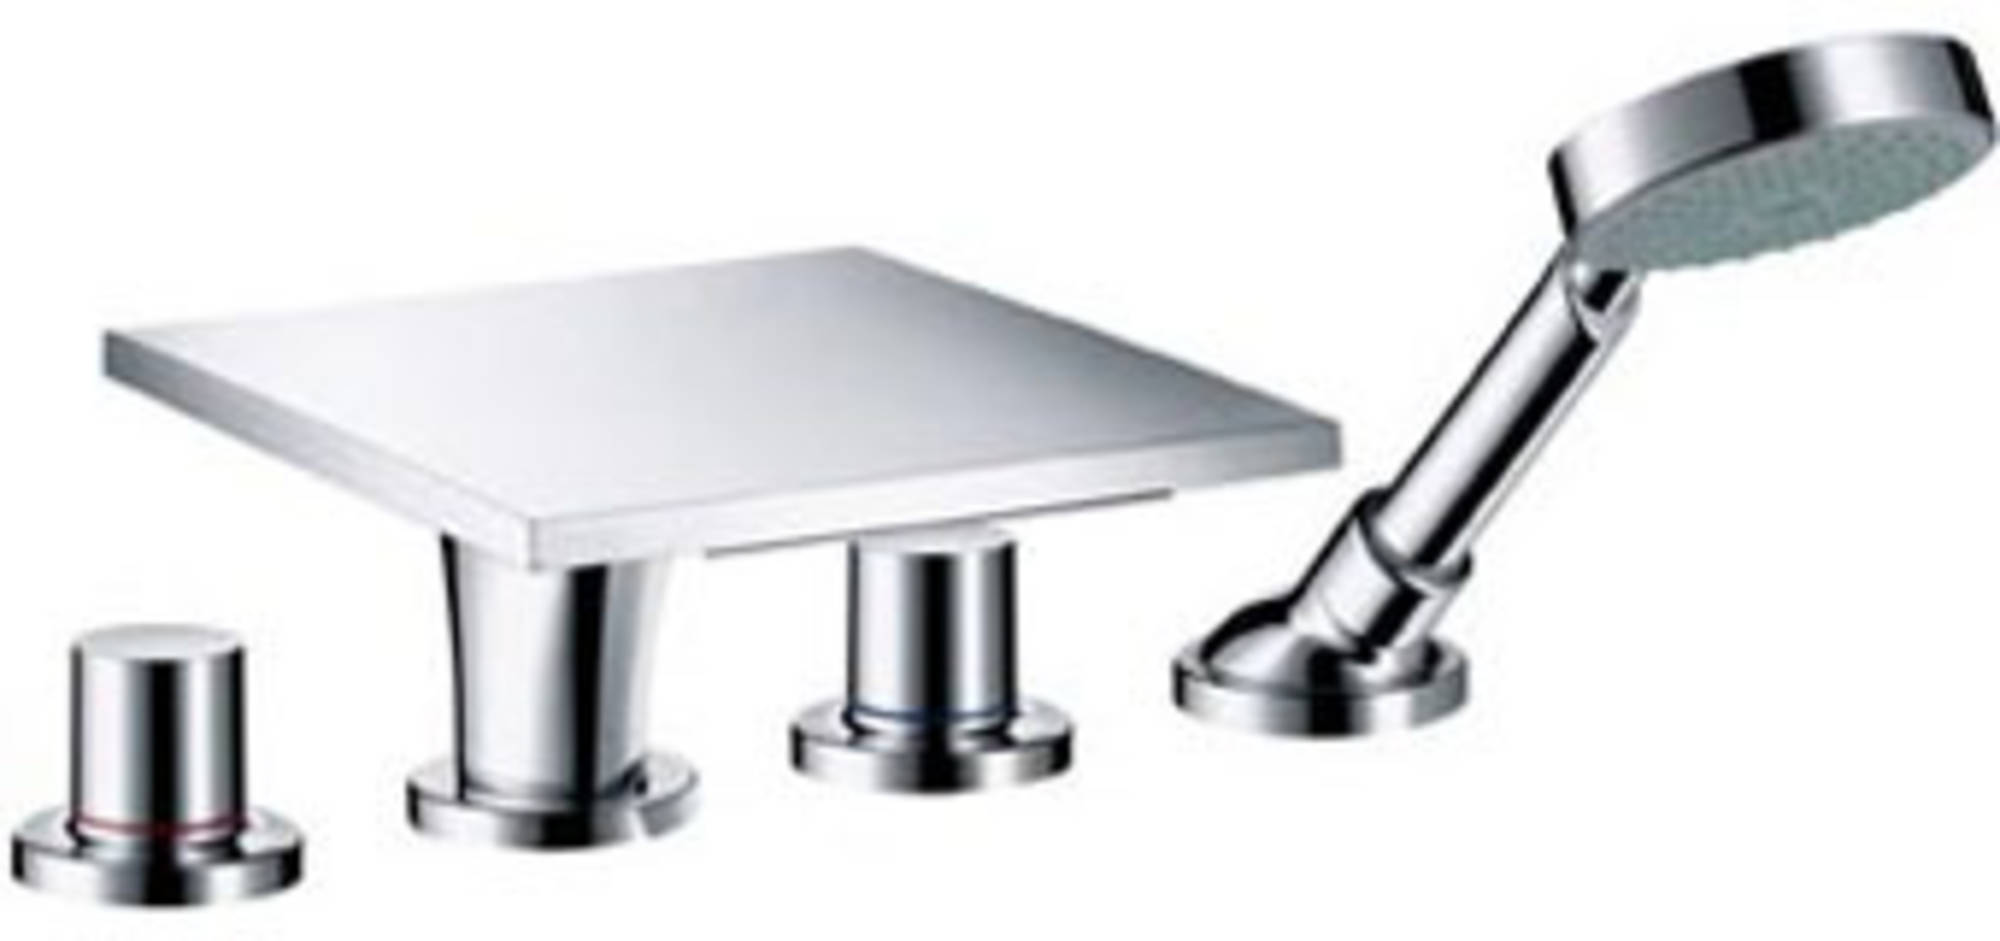 Axor Massaud afbouwdeel badrand inbouw 4-gats tegelrandmengkr. chroom 18440000